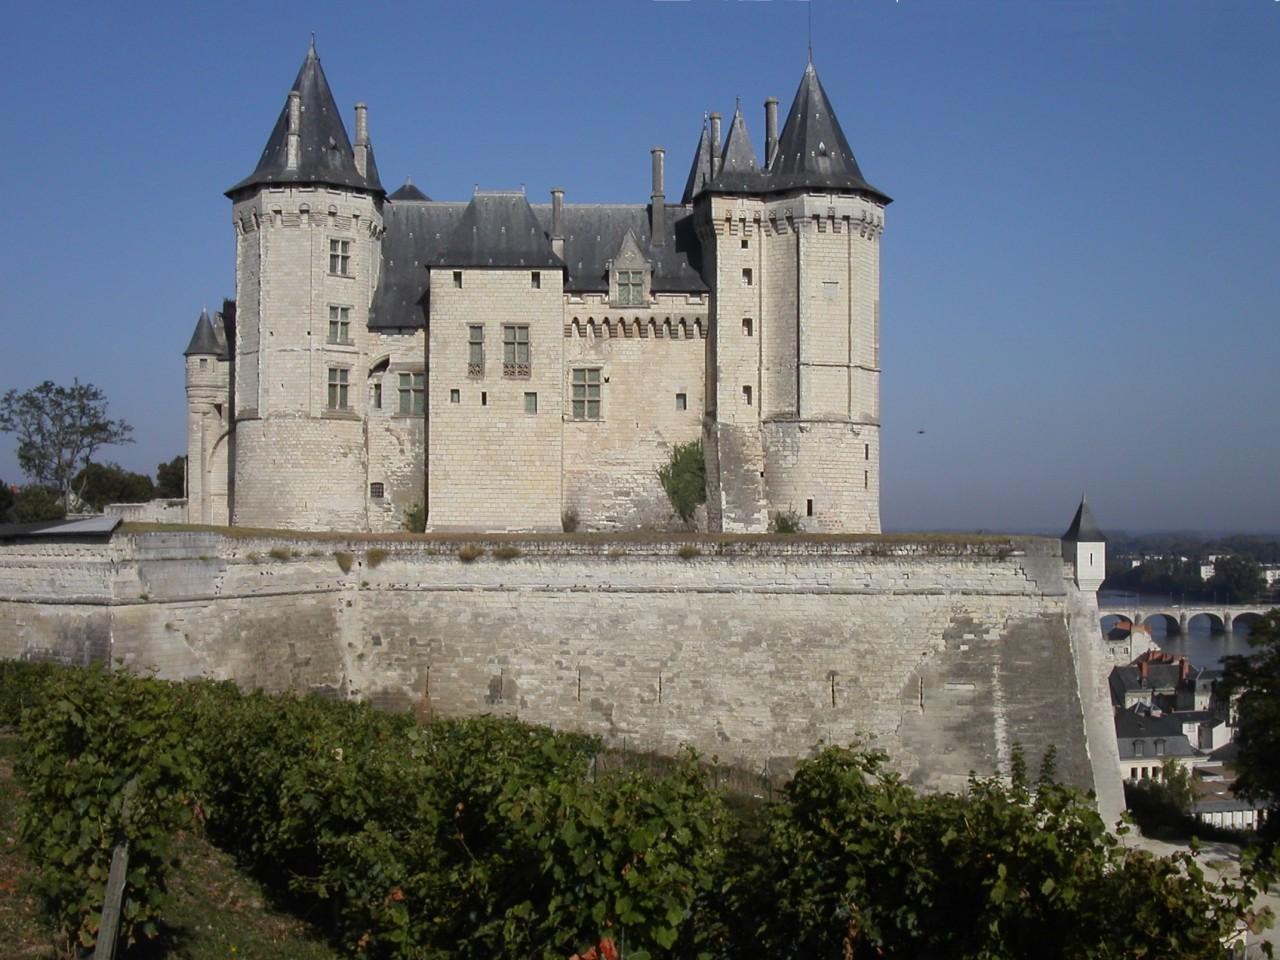 http://upload.wikimedia.org/wikipedia/commons/a/a6/Chateau_de_saumur.jpg